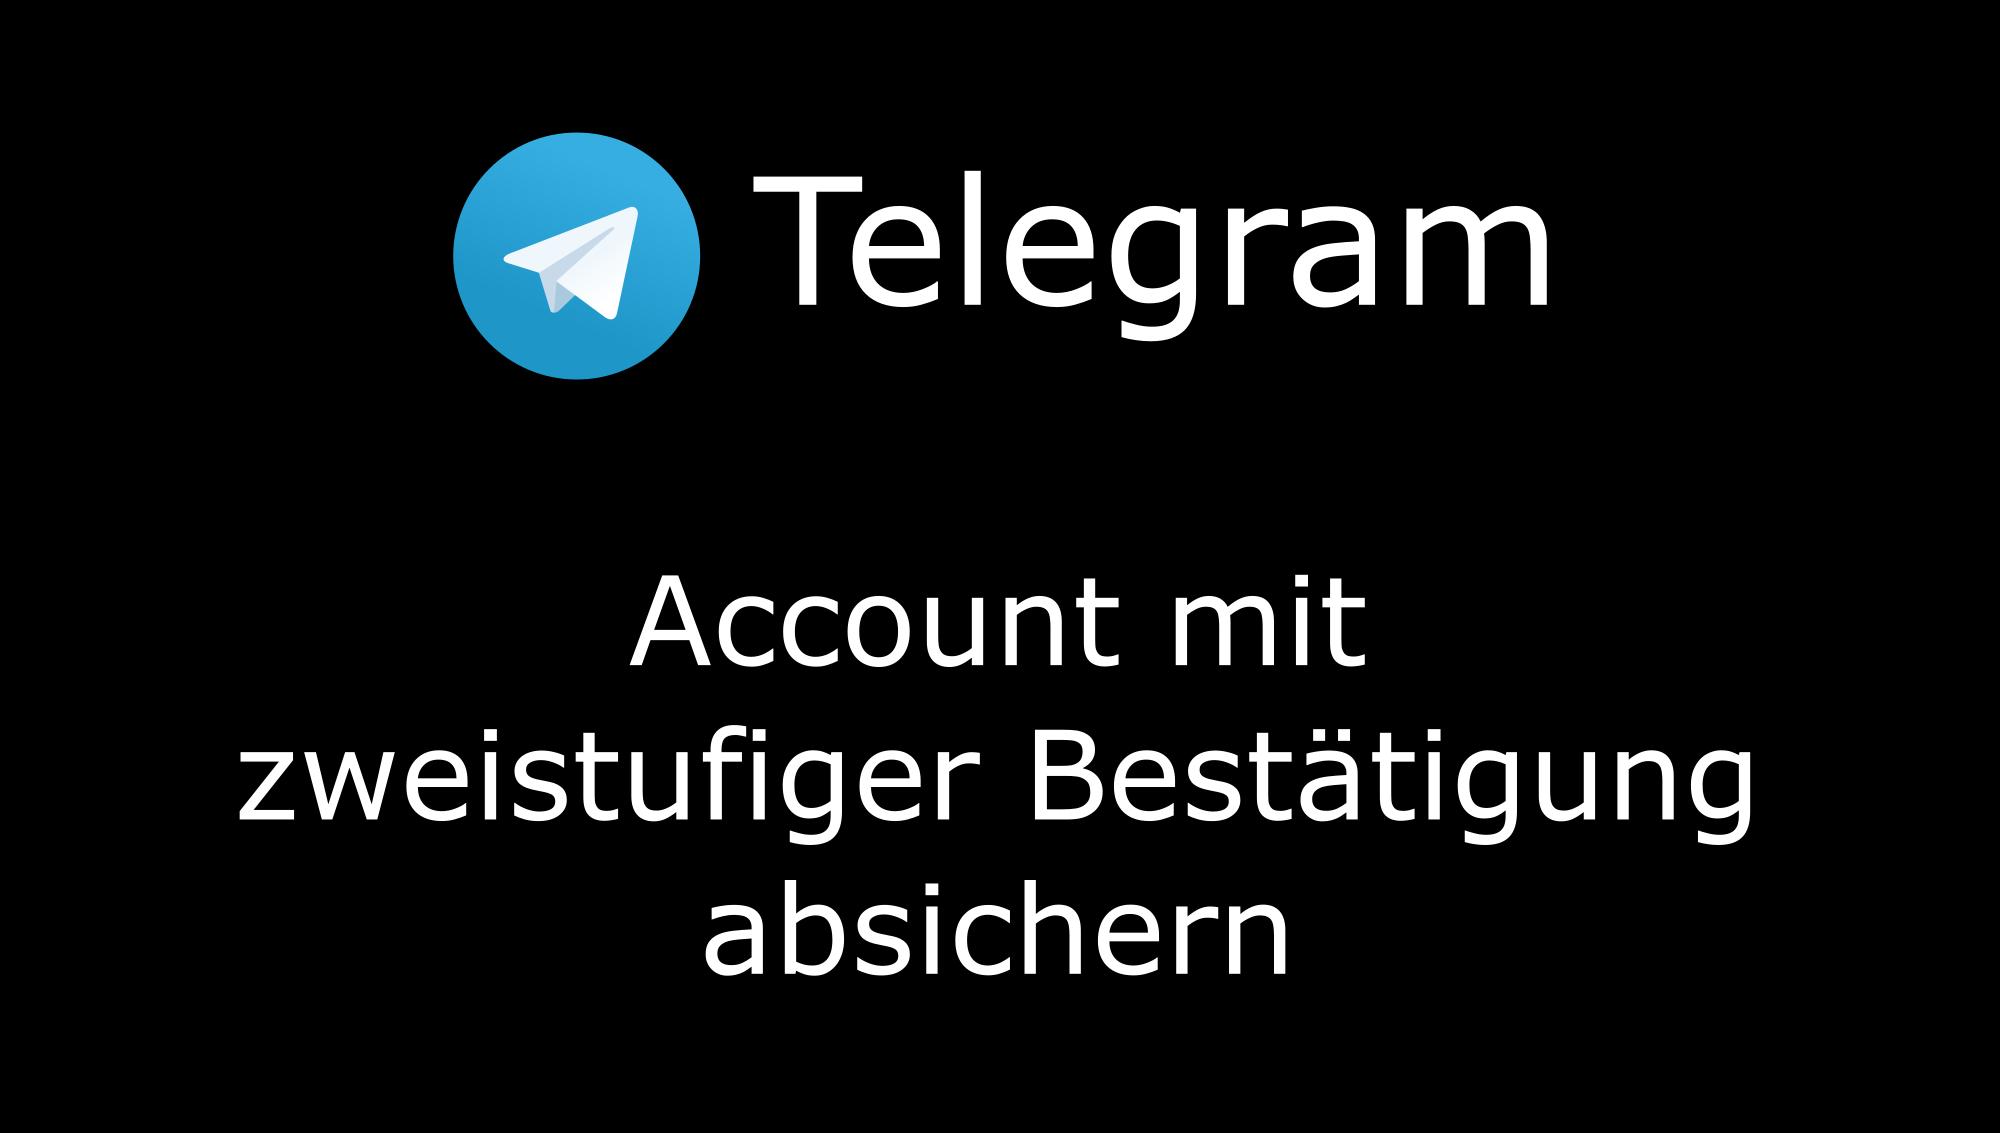 Implementation/docs/wp-content/uploads/2018/04/telegram-zwei-wege-authentifizierung.png